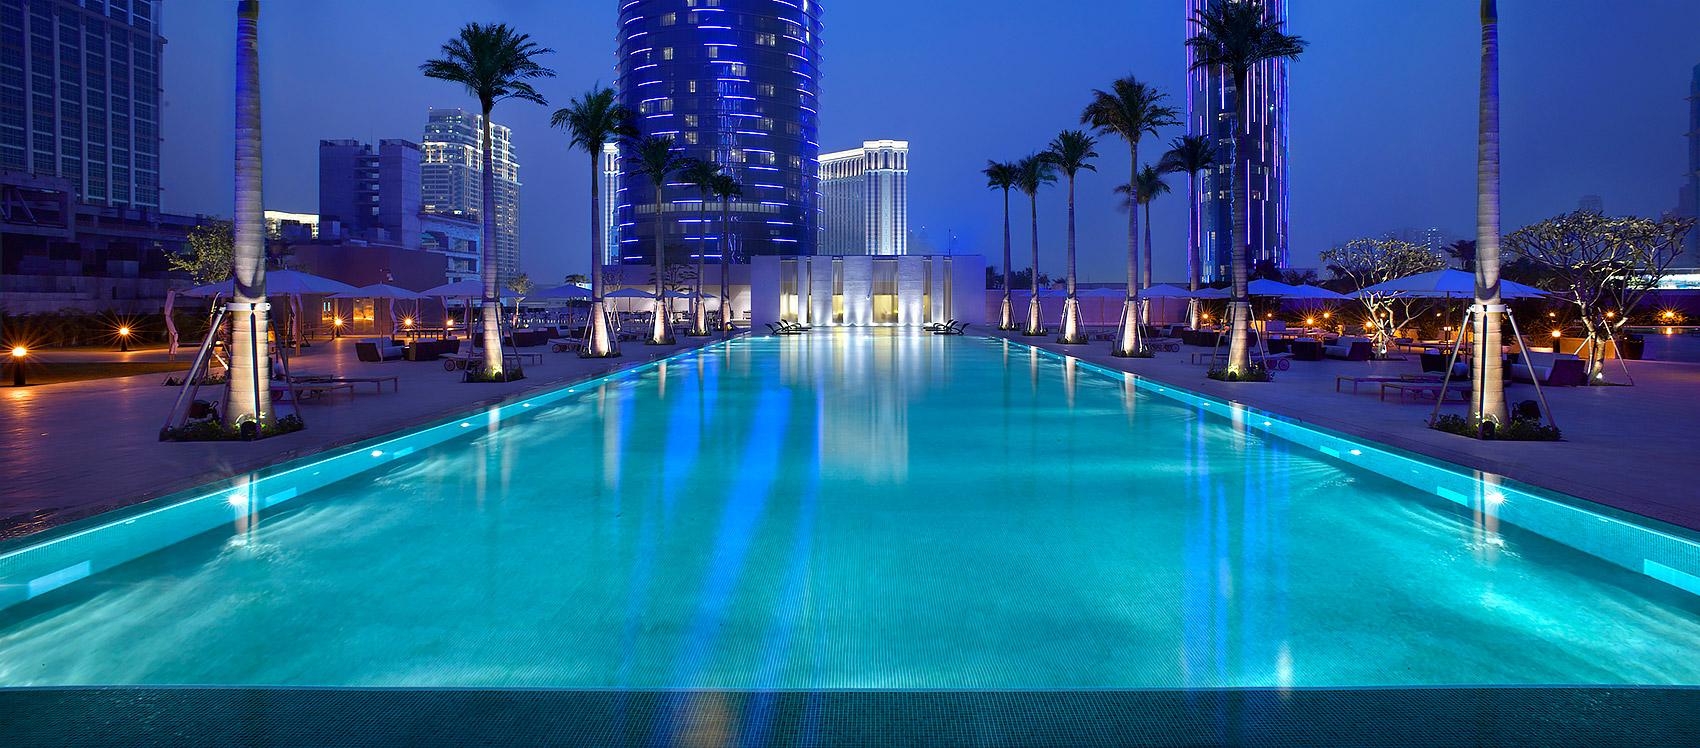 Dg Manila Grand Hyatt Macau